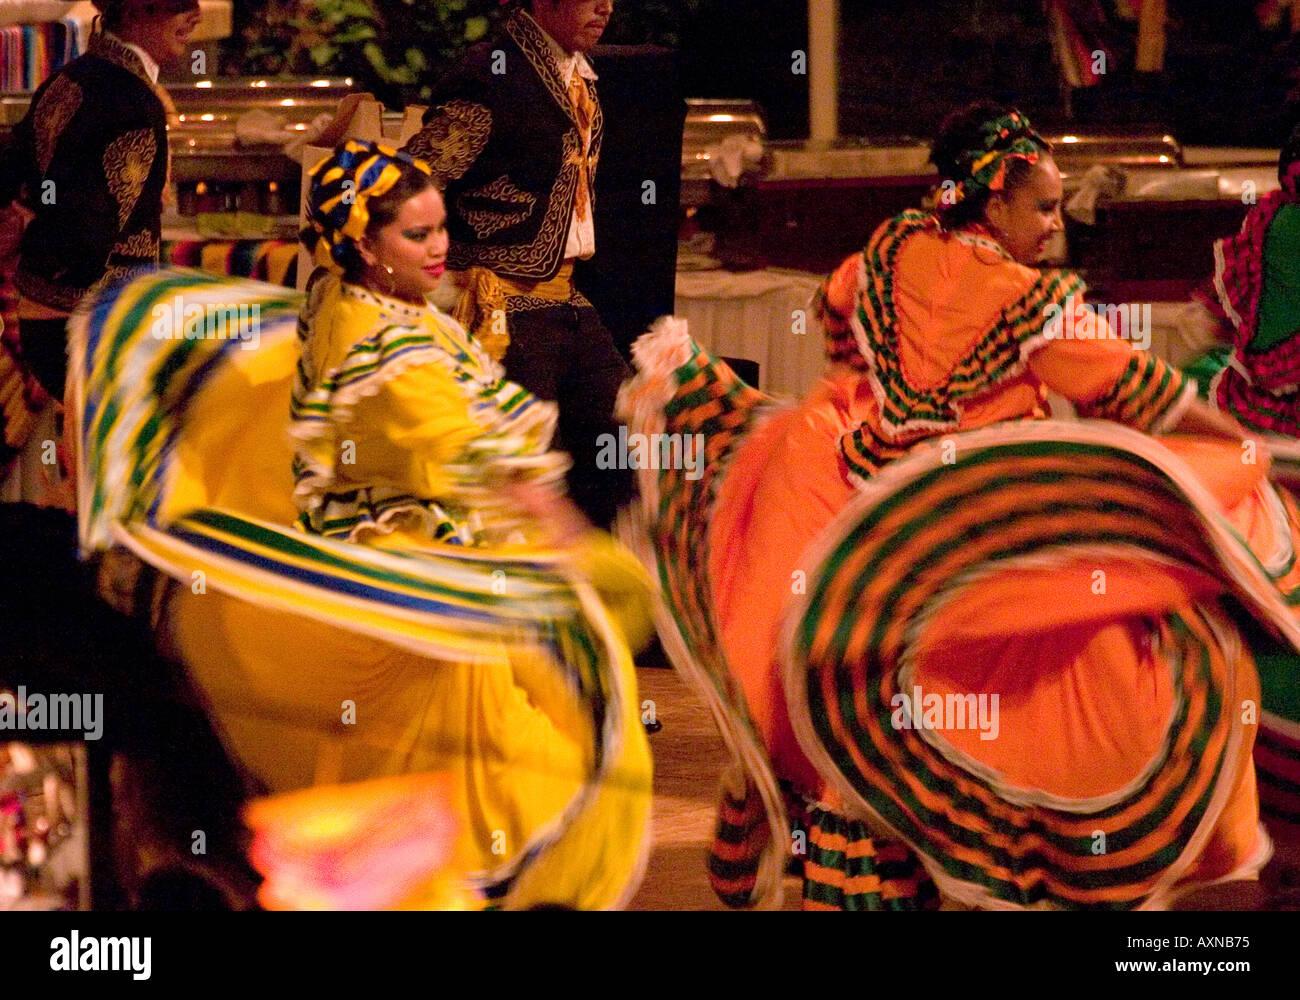 mexican music show dancers villa del palmar cabo san lucas baja